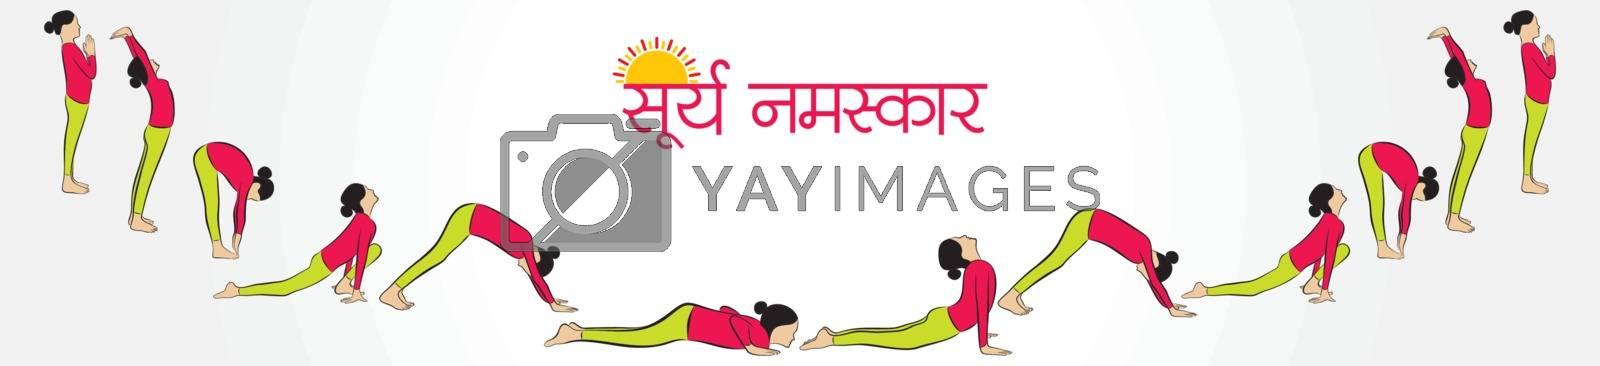 illustration of woman doing SURYA NAMASKAR by graphicsdunia4you